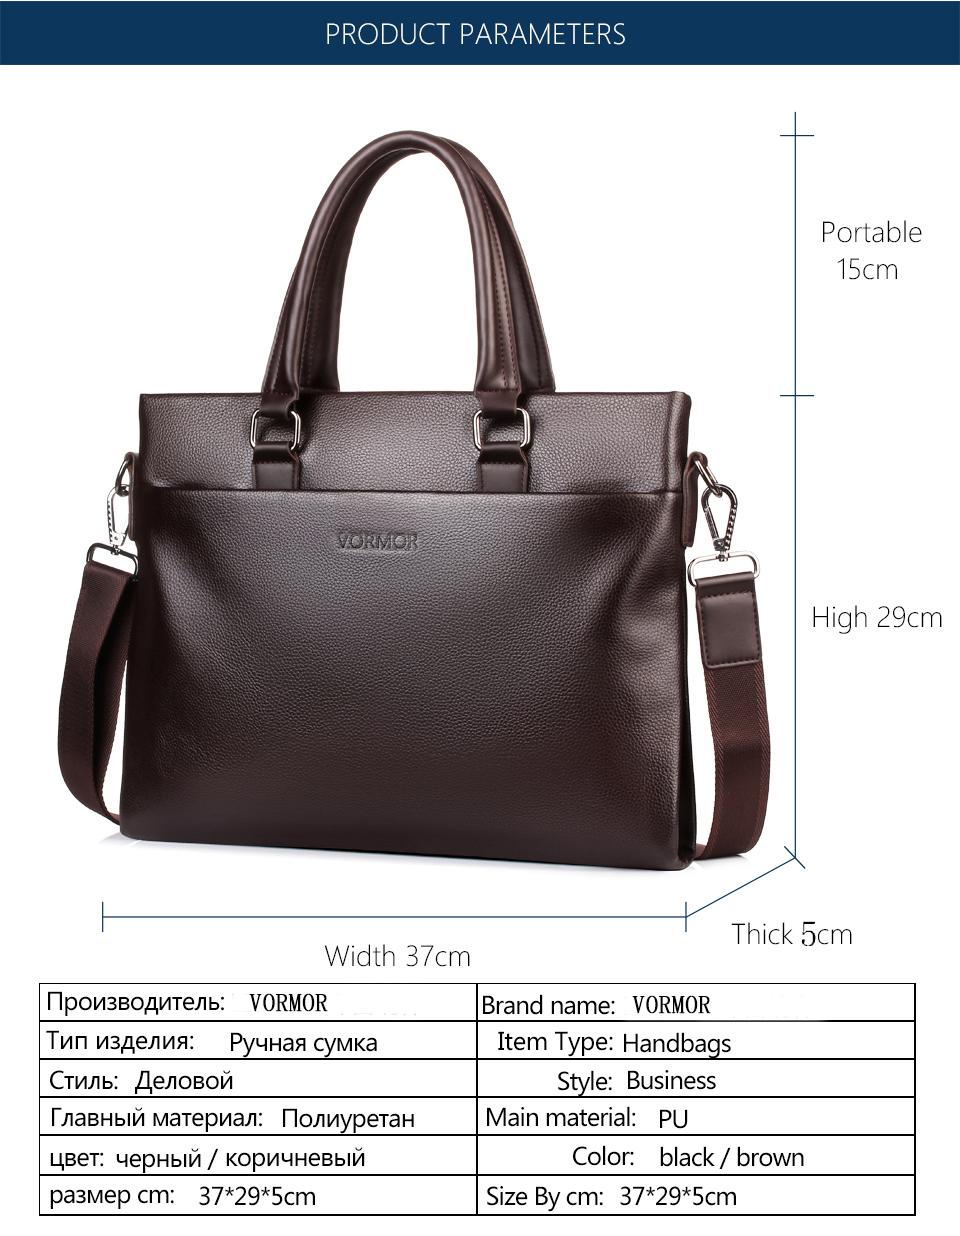 c620090a6e3d VORMOR PU Leather bag Business Men bags Laptop Tote Briefcases Crossbody  bags Shoulder Handbag Men s Messenger Bag 17052